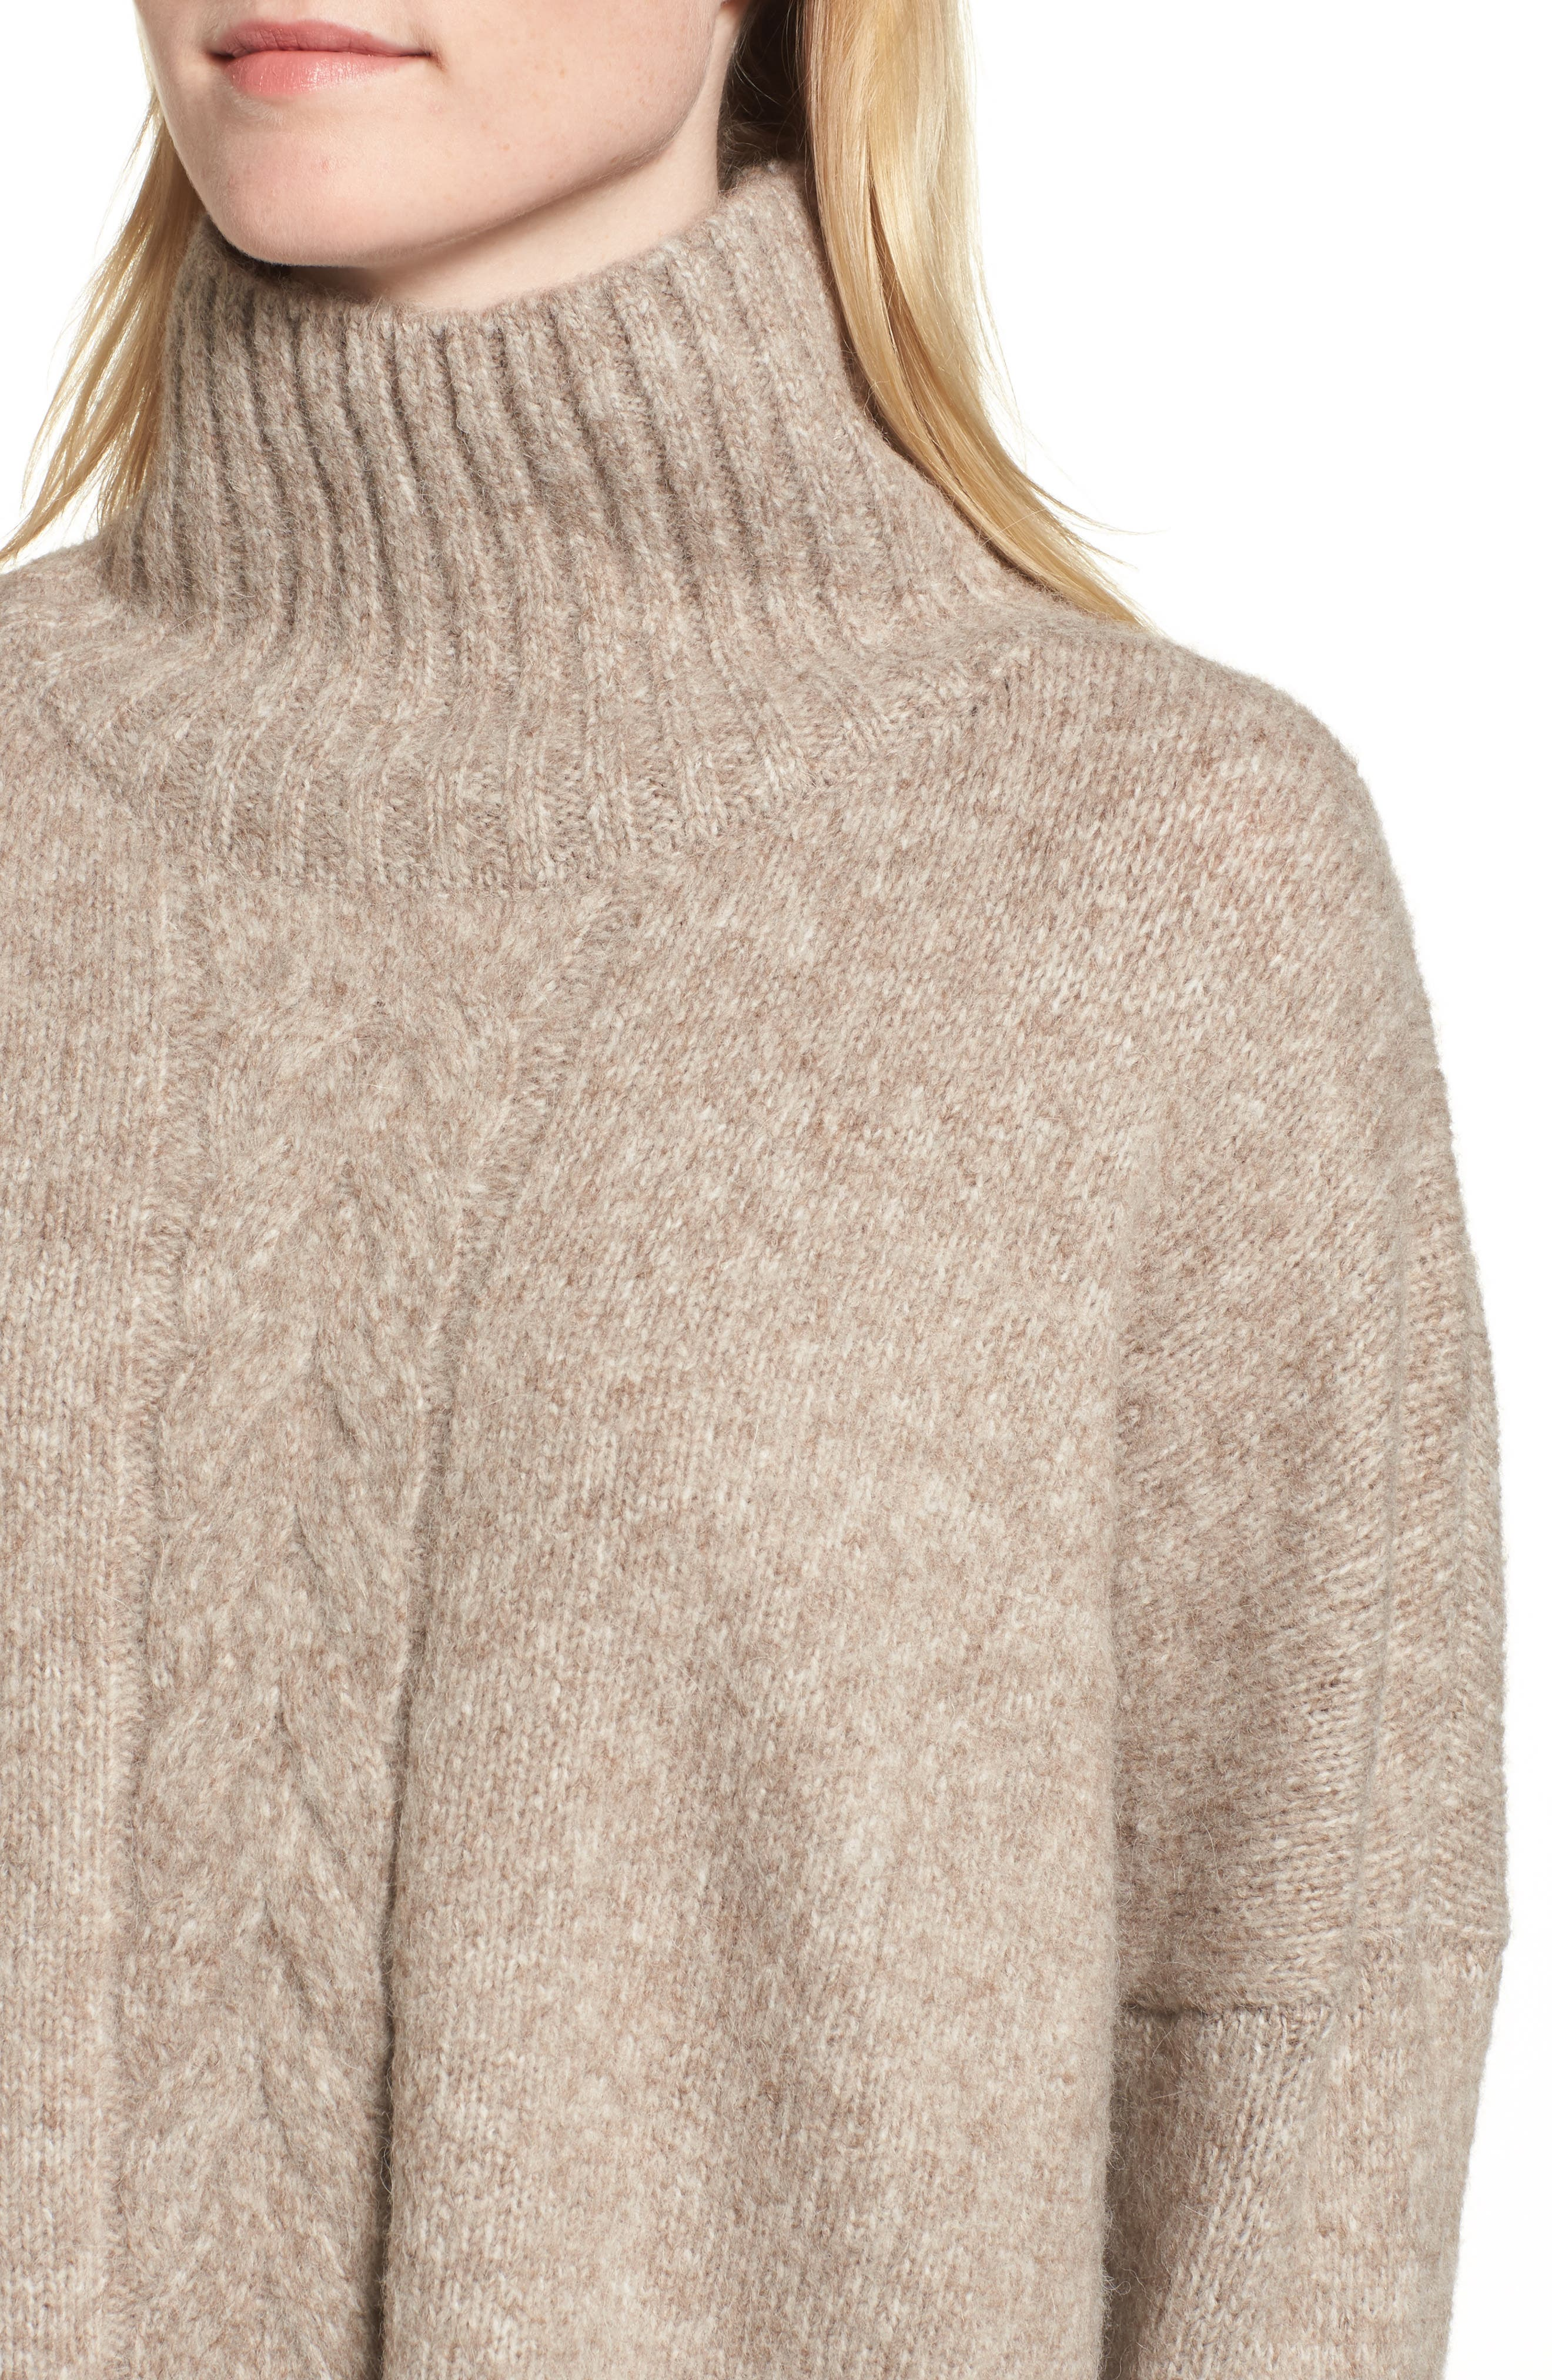 Ora Mock Neck Sweater,                             Alternate thumbnail 4, color,                             250